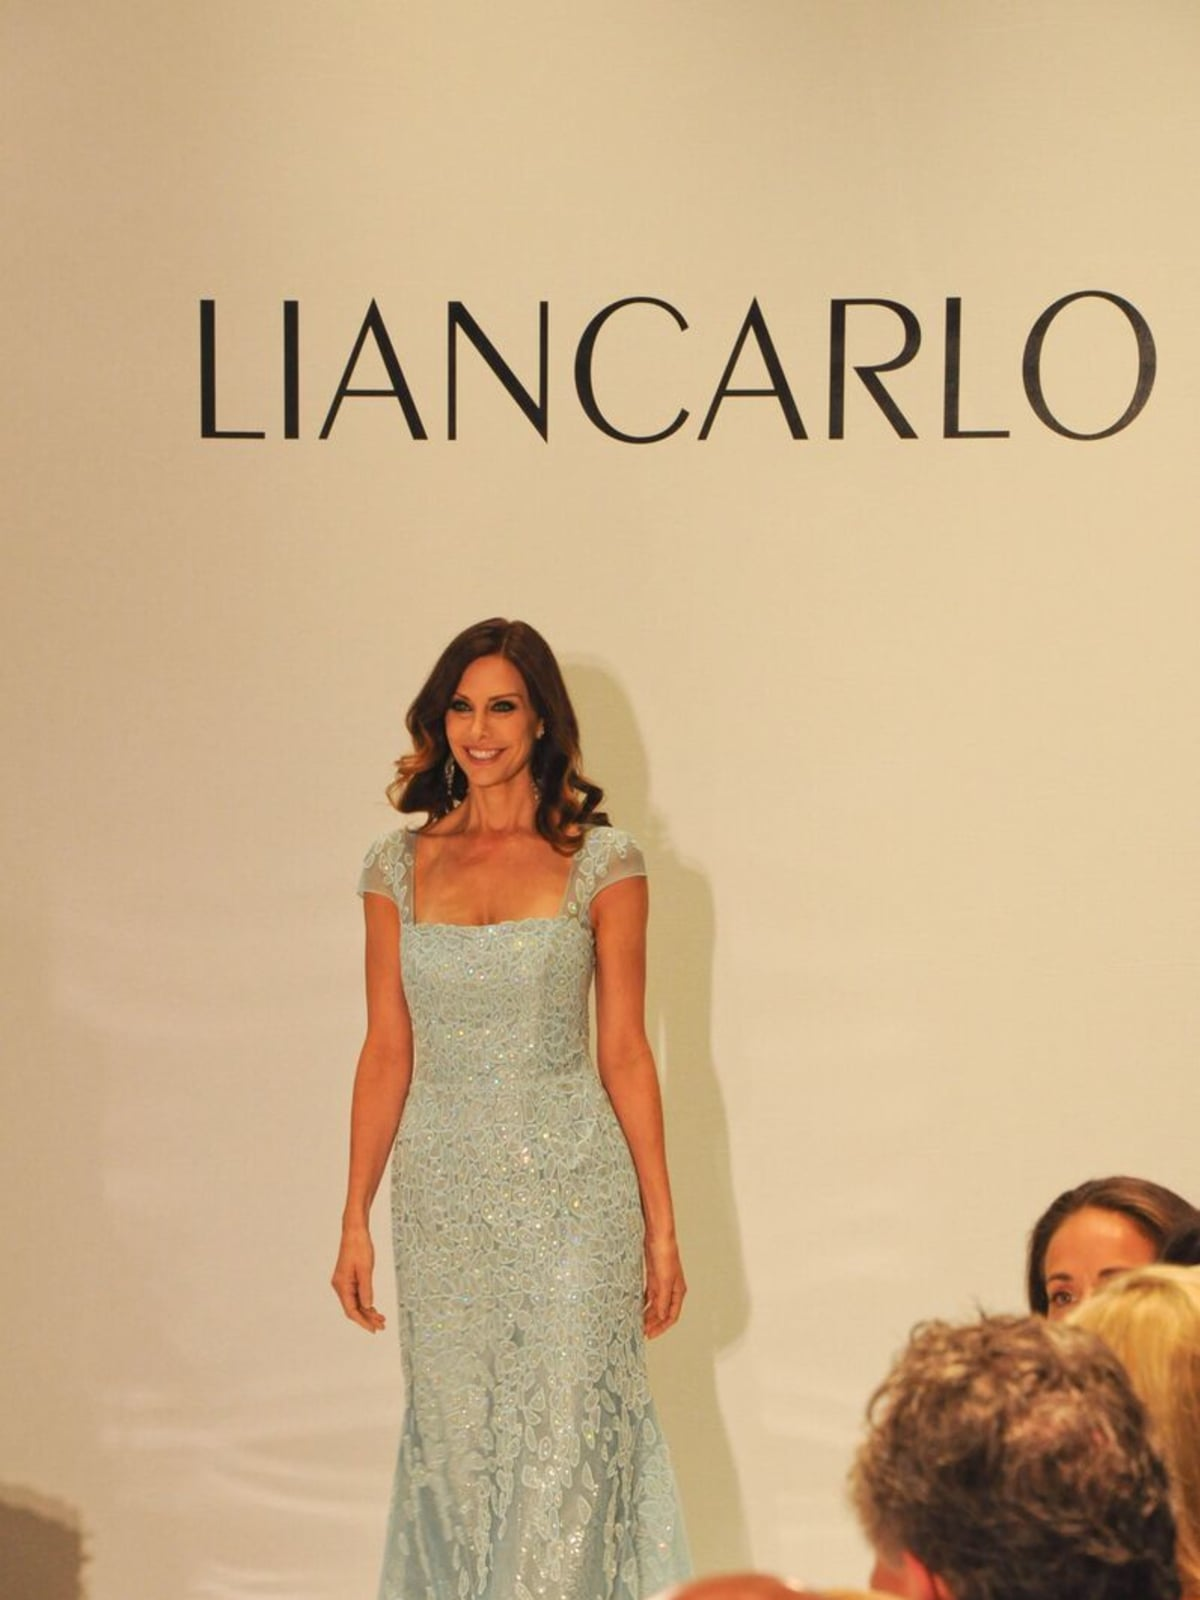 Liancarlo gown